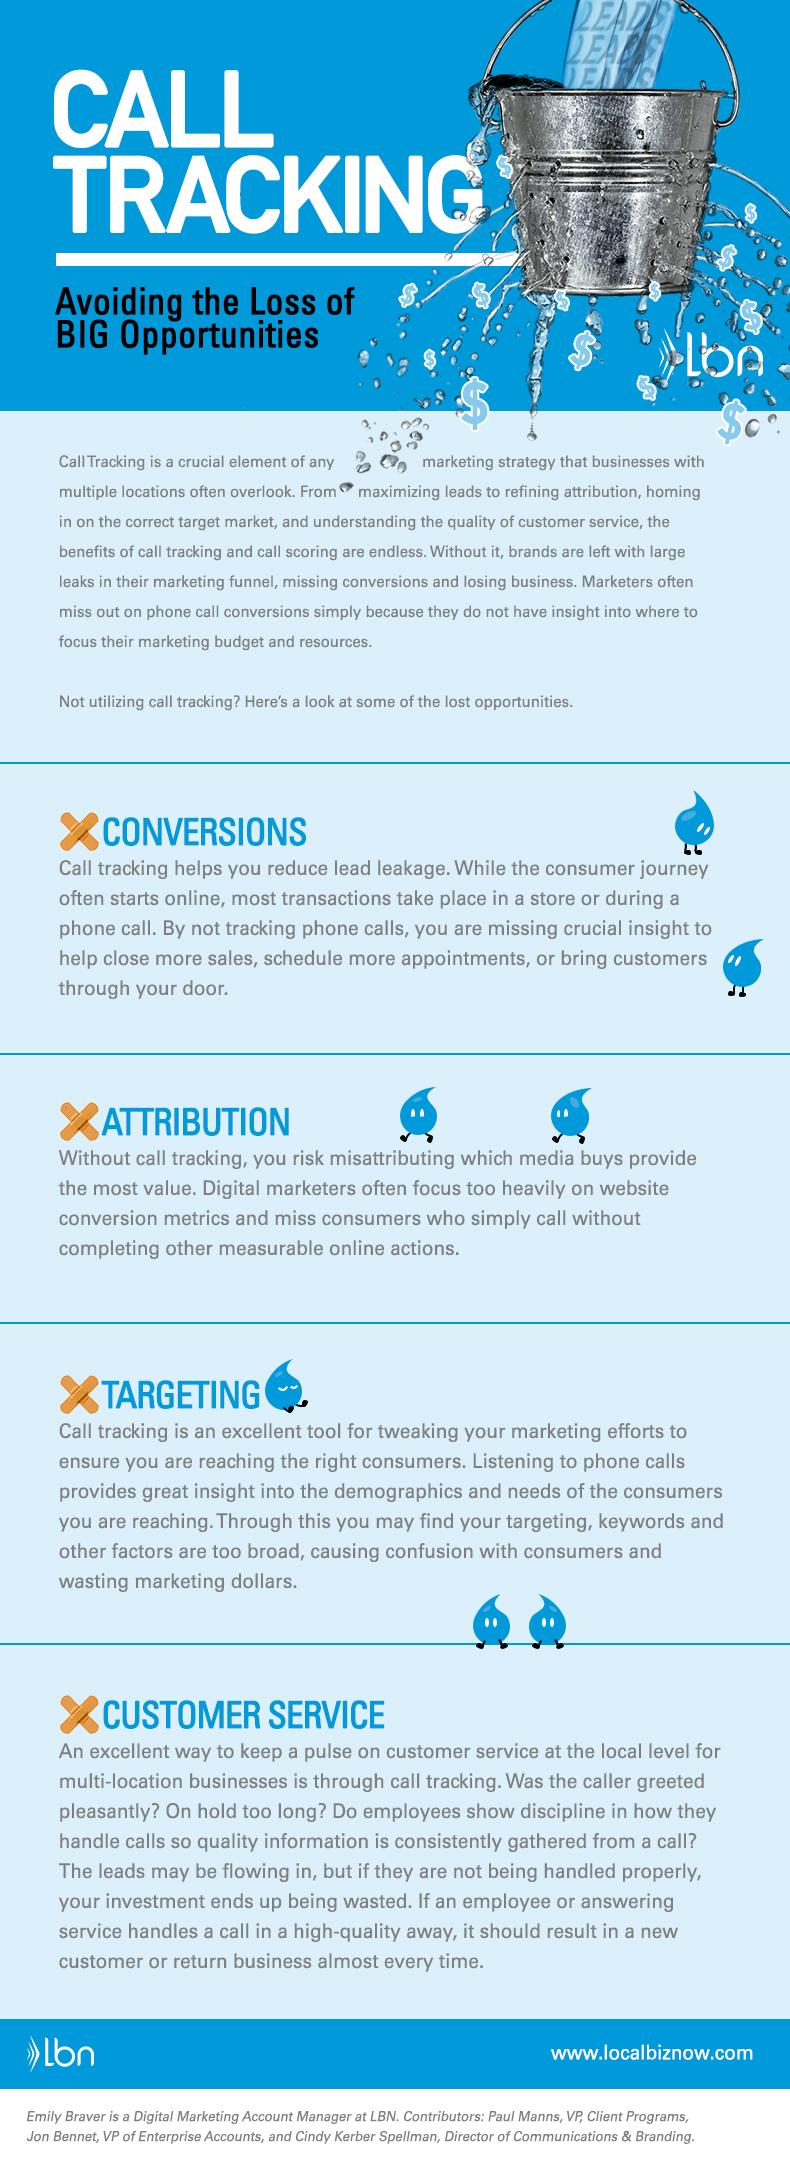 CallTracking_Infographic-1